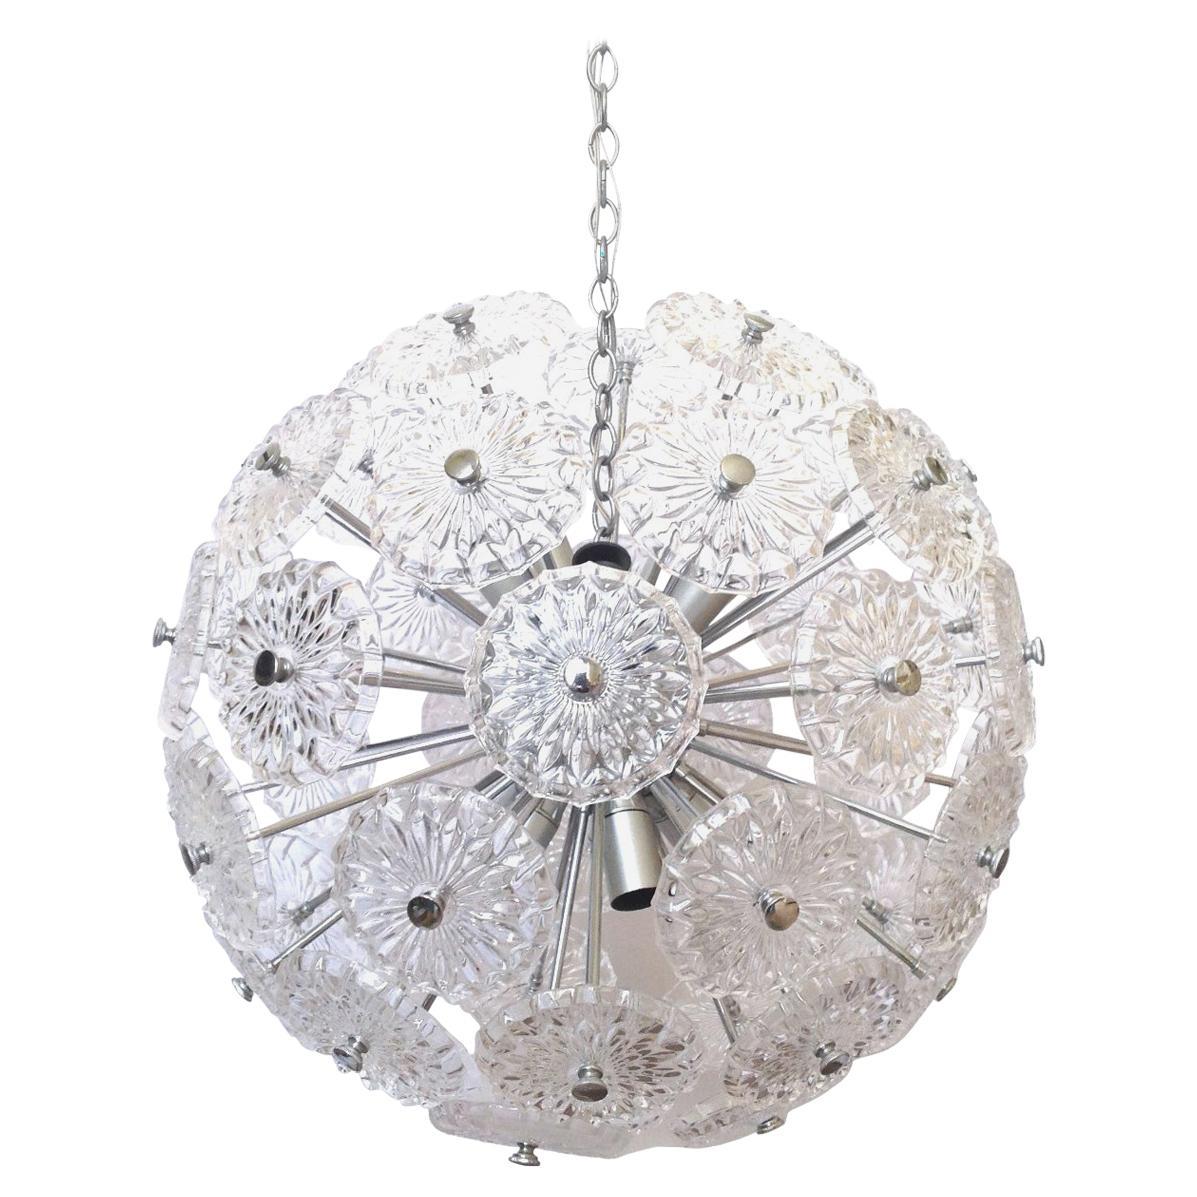 Germany Midcentury Sputnik Clear Crystal Chandelier, 1960s